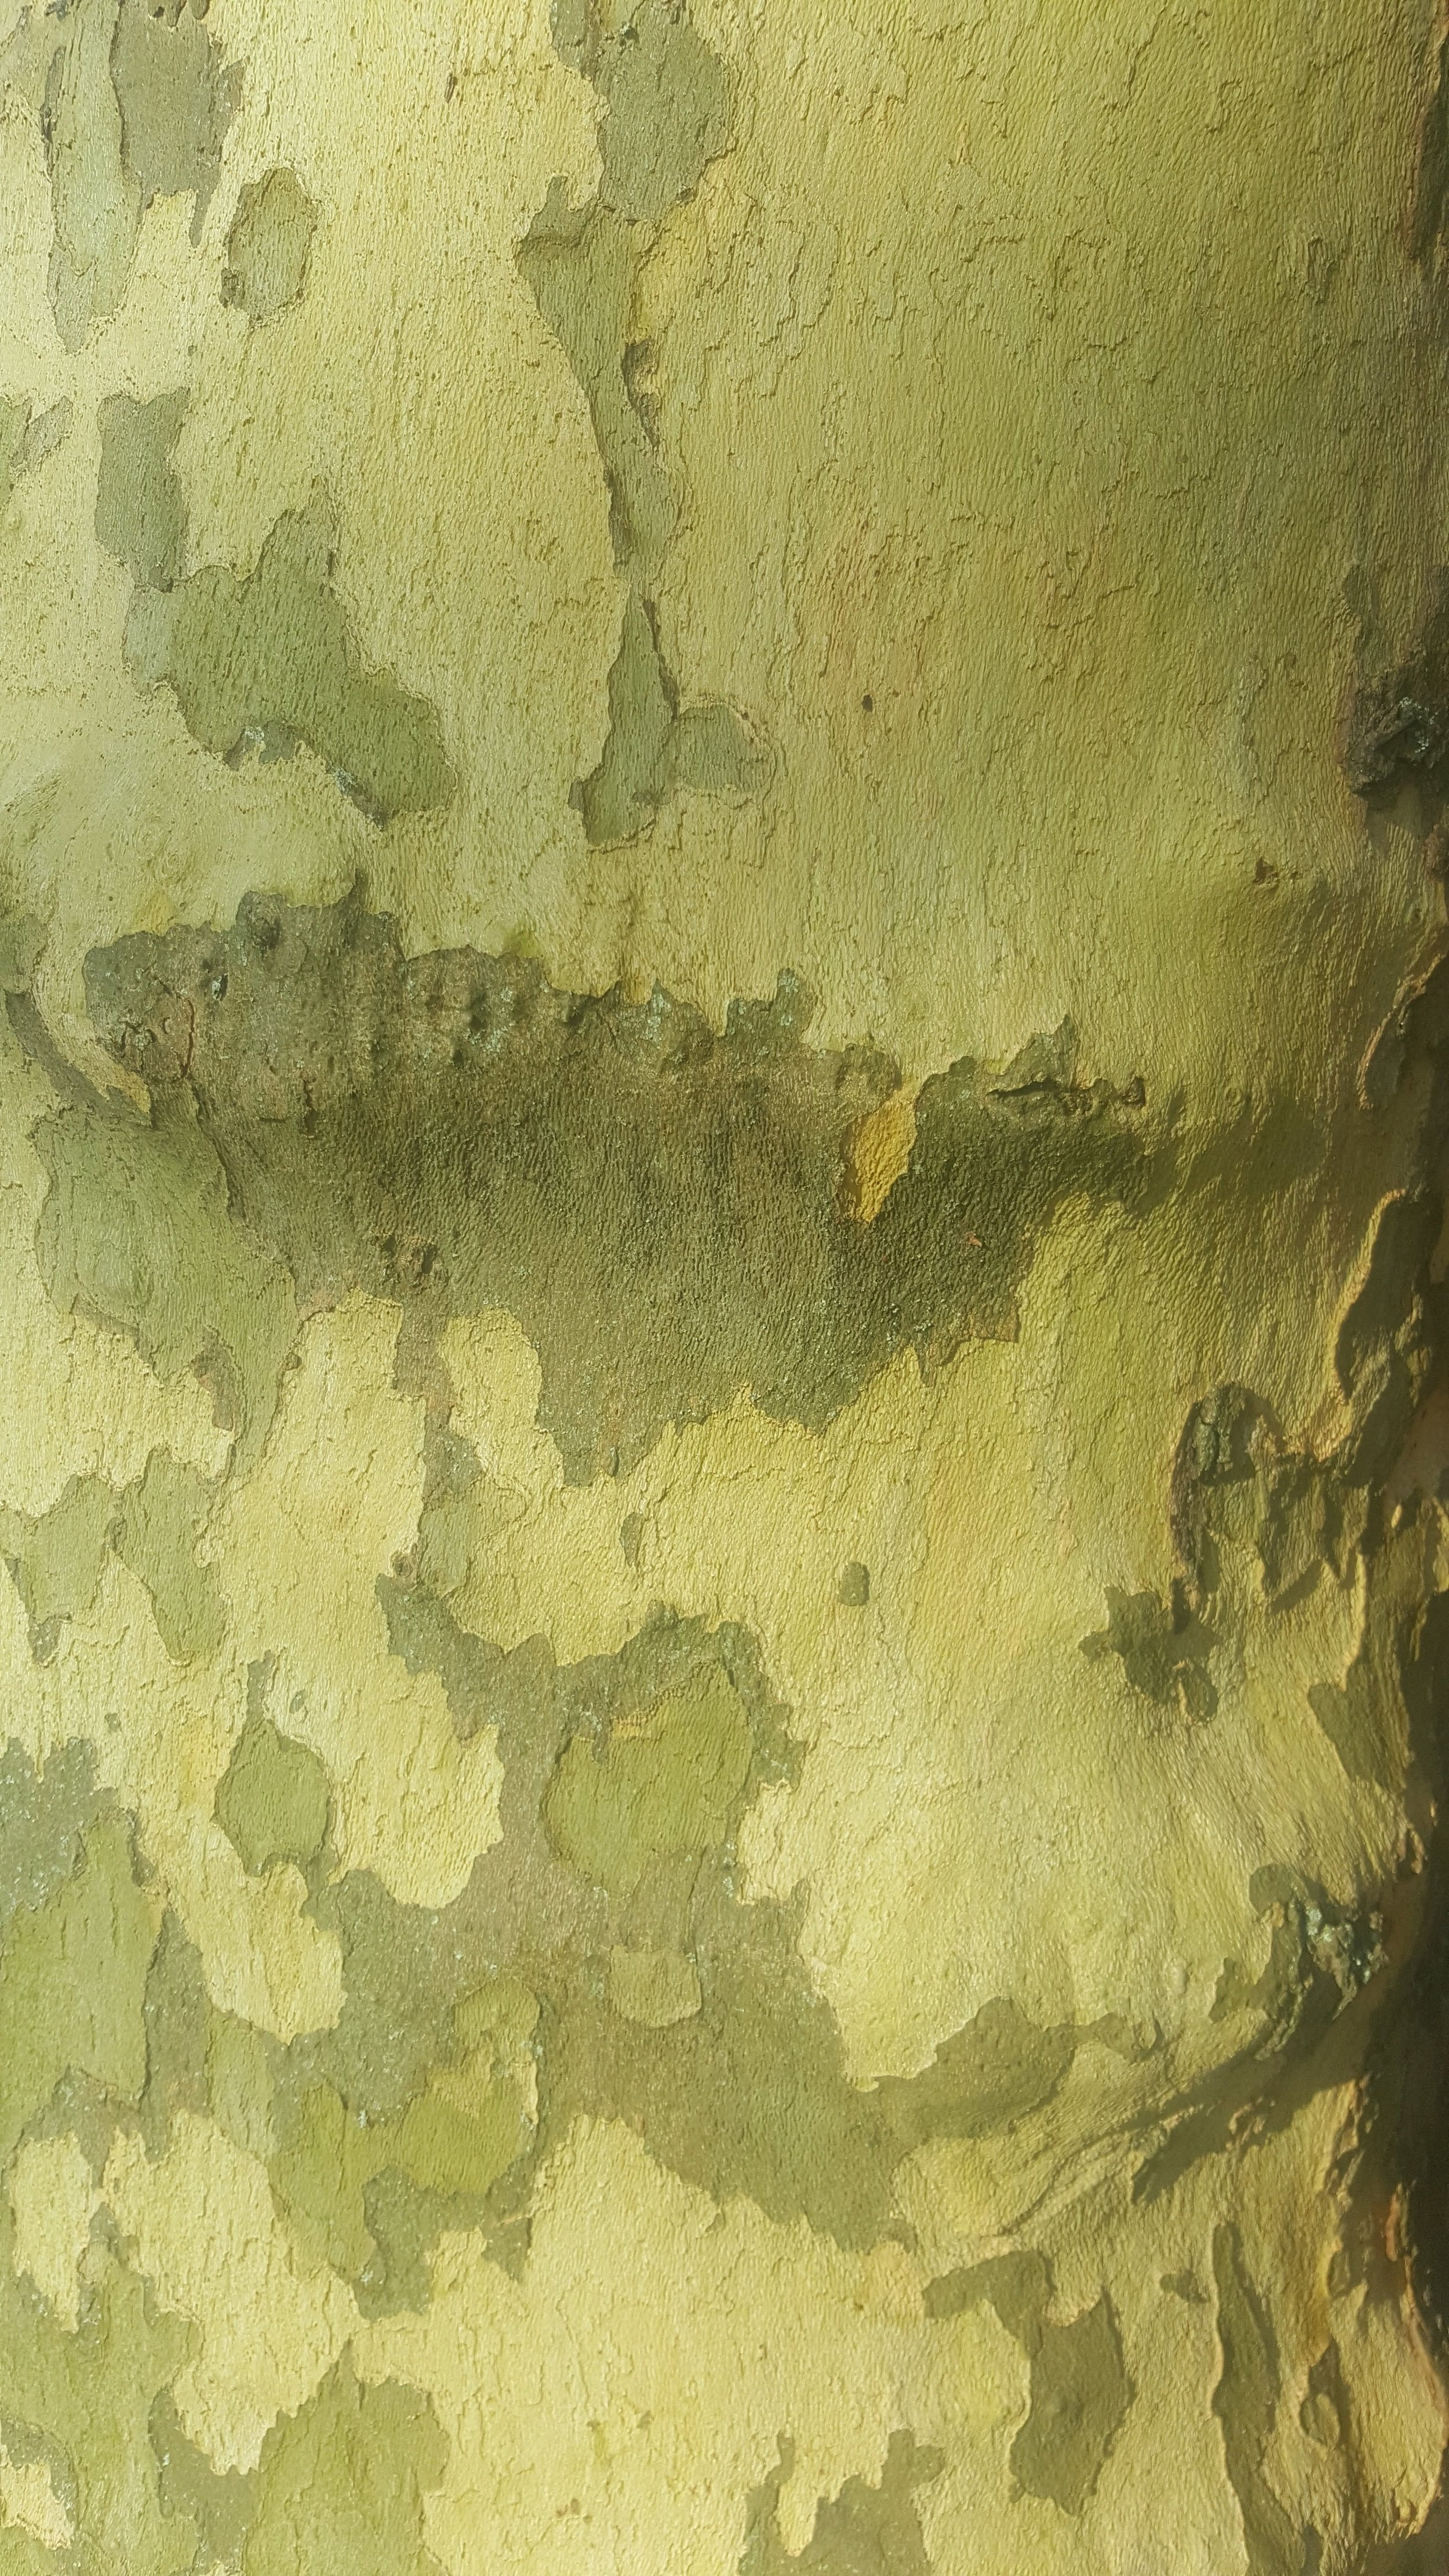 'Camo' style bark pattern